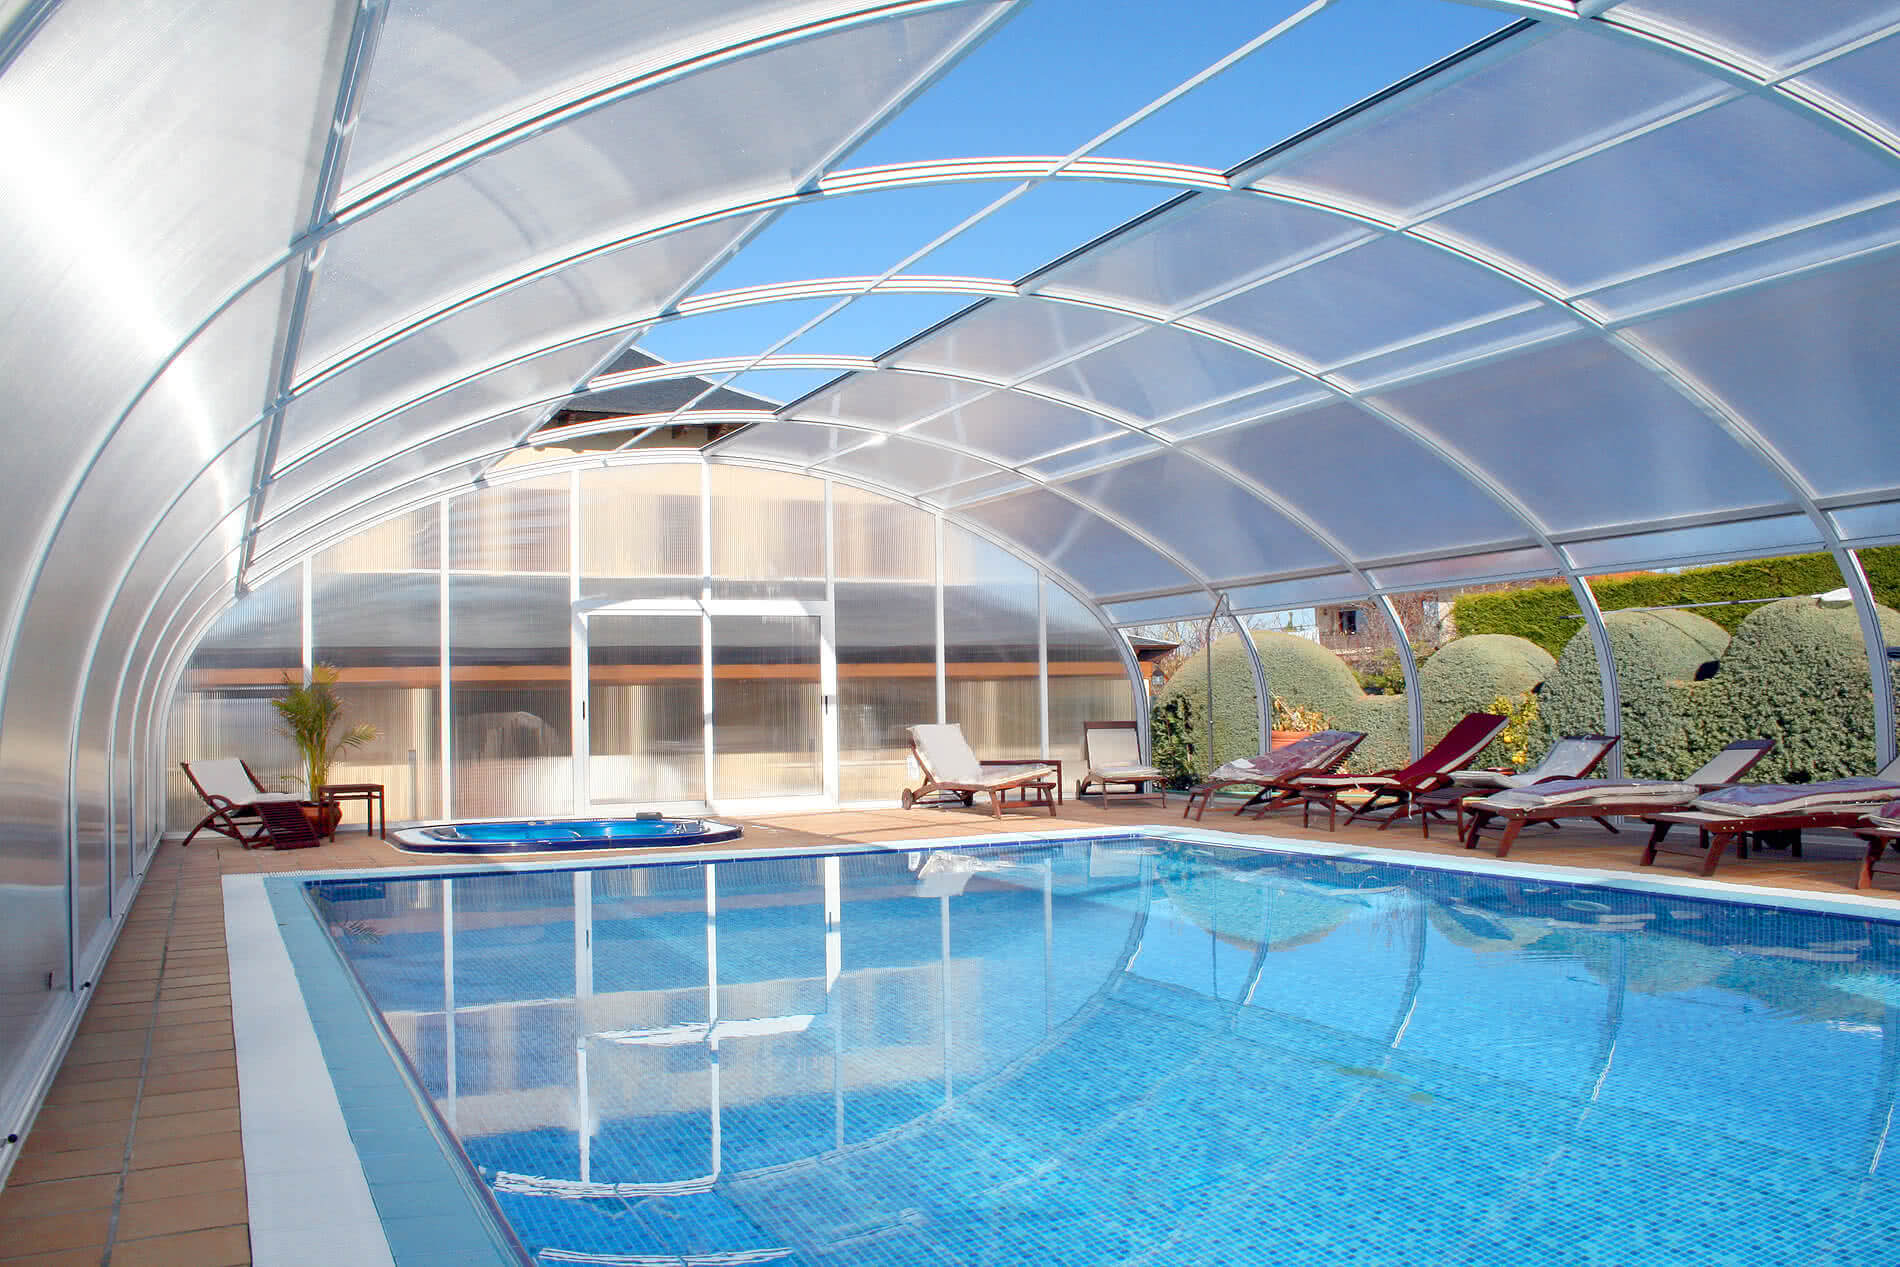 Etna cubierta fija para piscinas tecnyvan fabricantes for Fabricantes piscinas